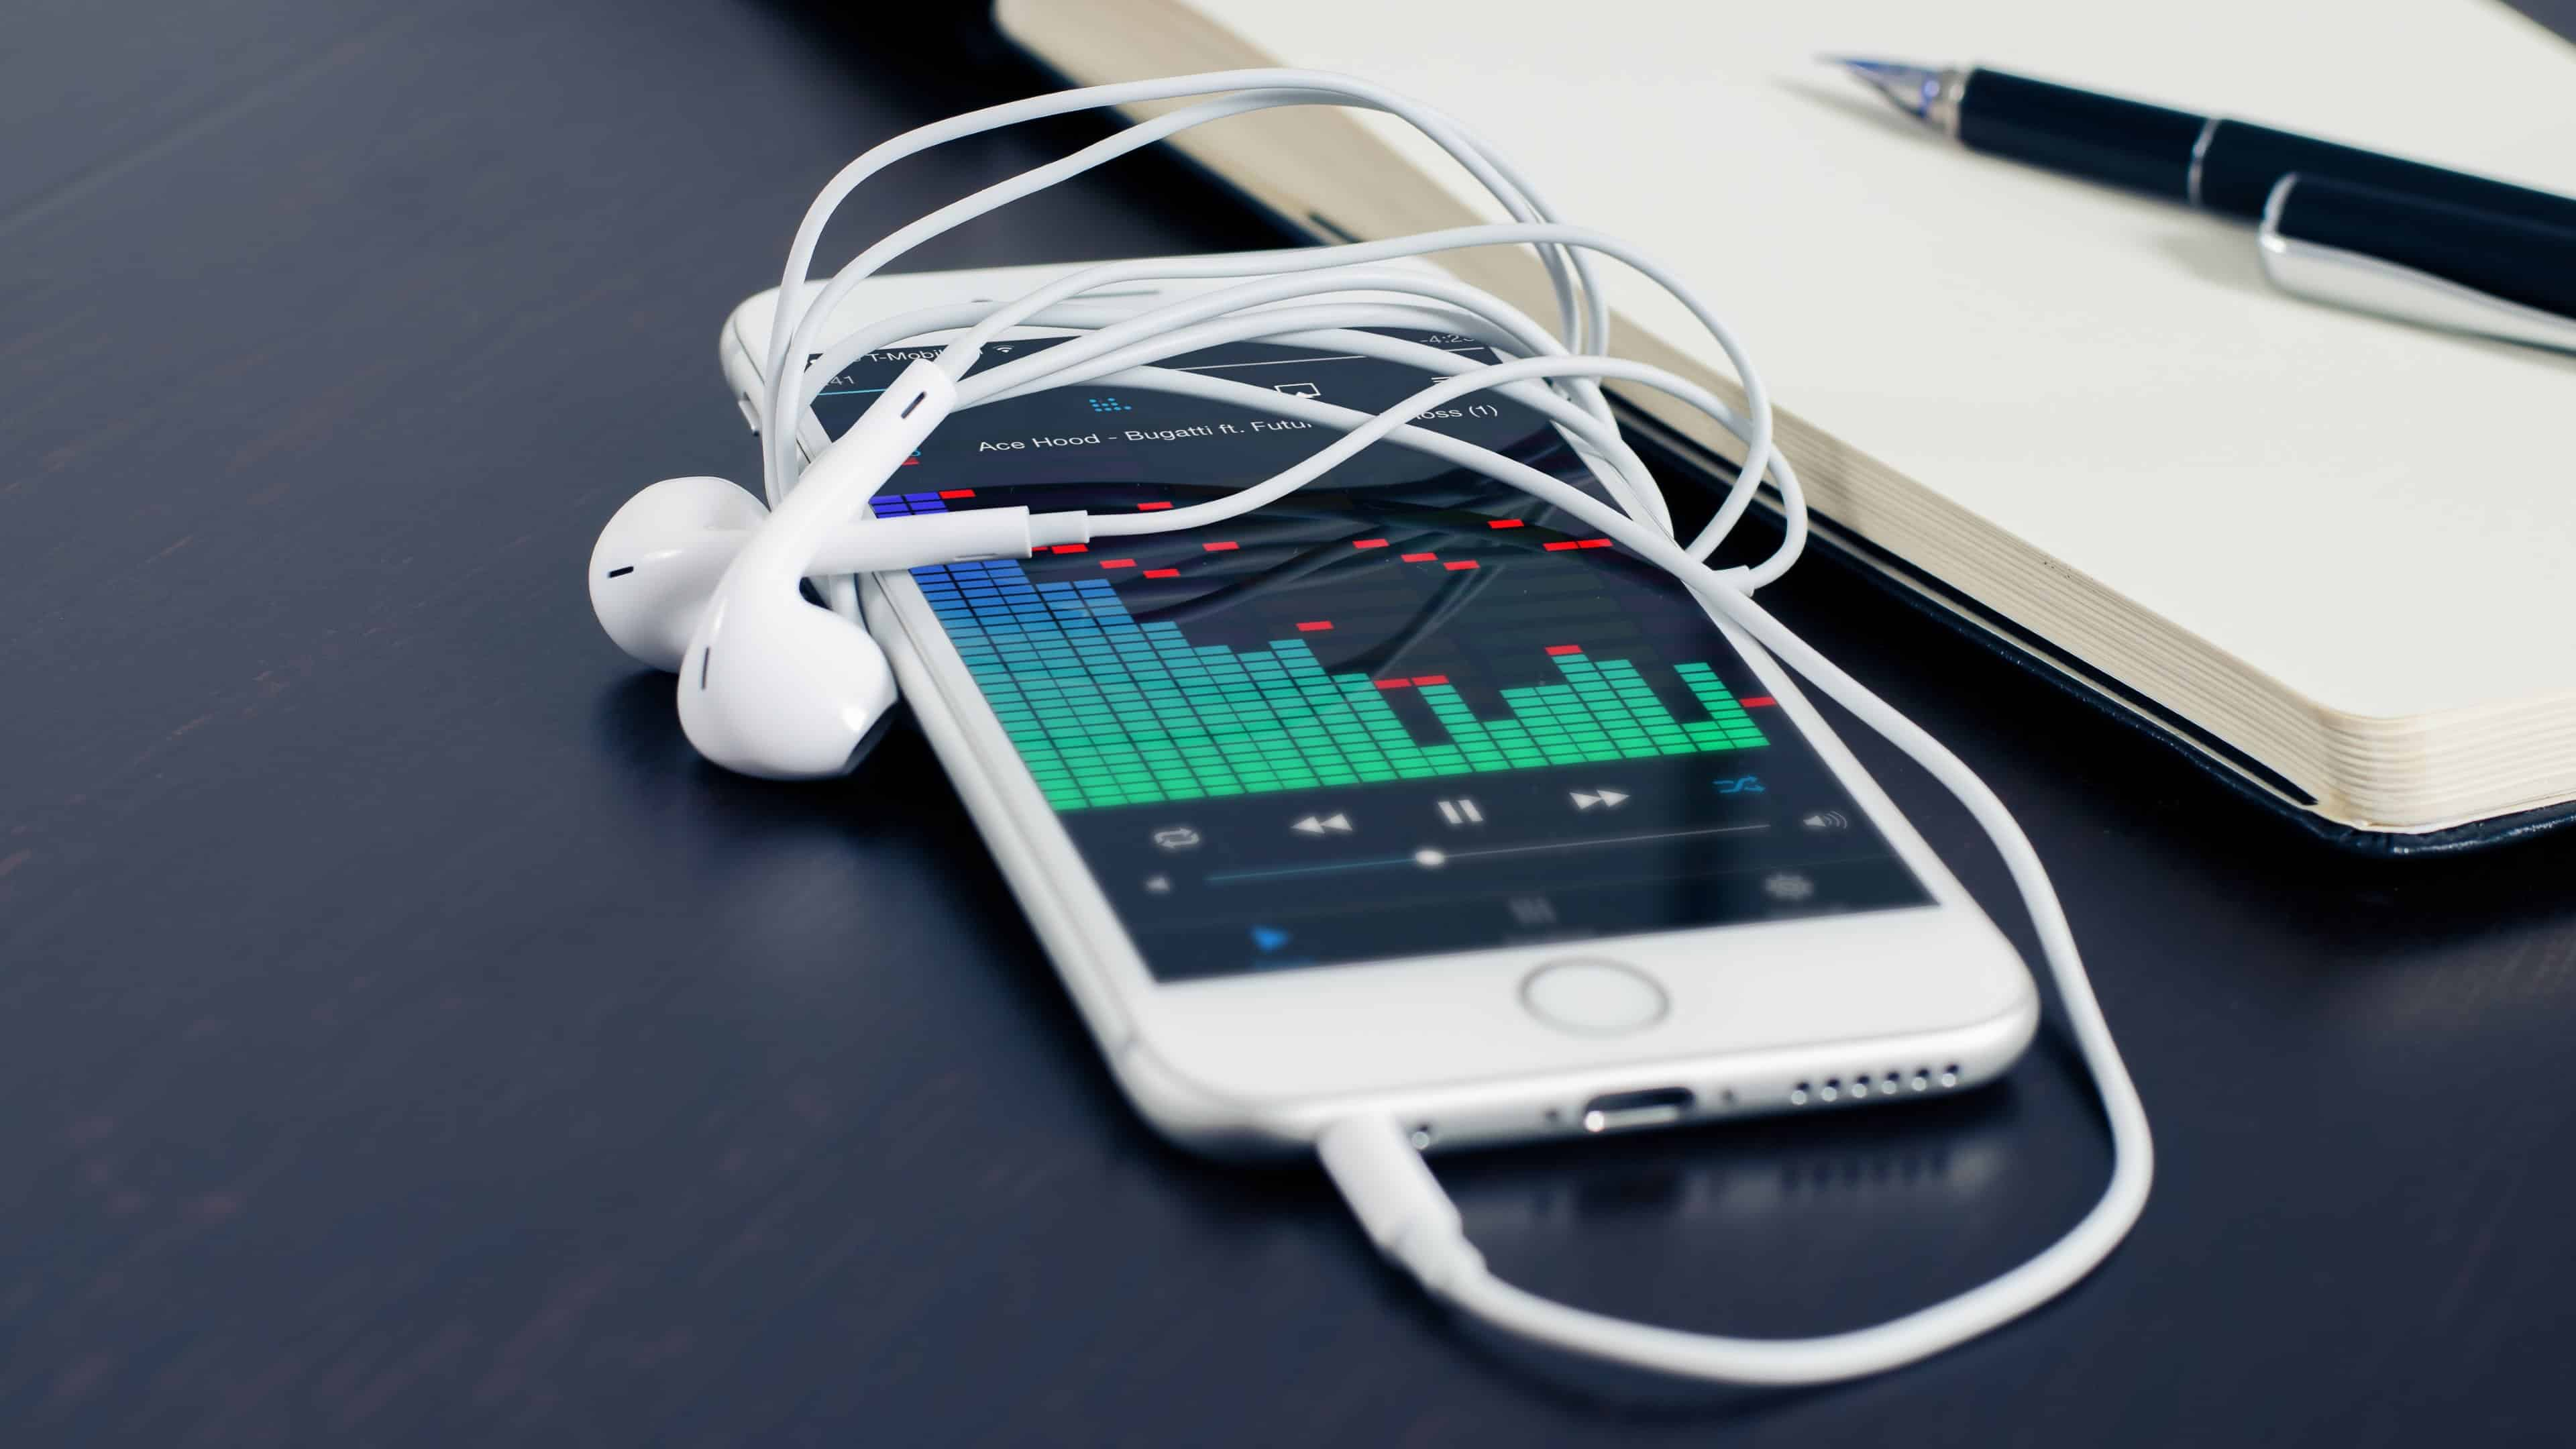 Iphone 6s Plus 4k Wallpaper: Apple IPhone 6S White And Heaphones UHD 4K Wallpaper